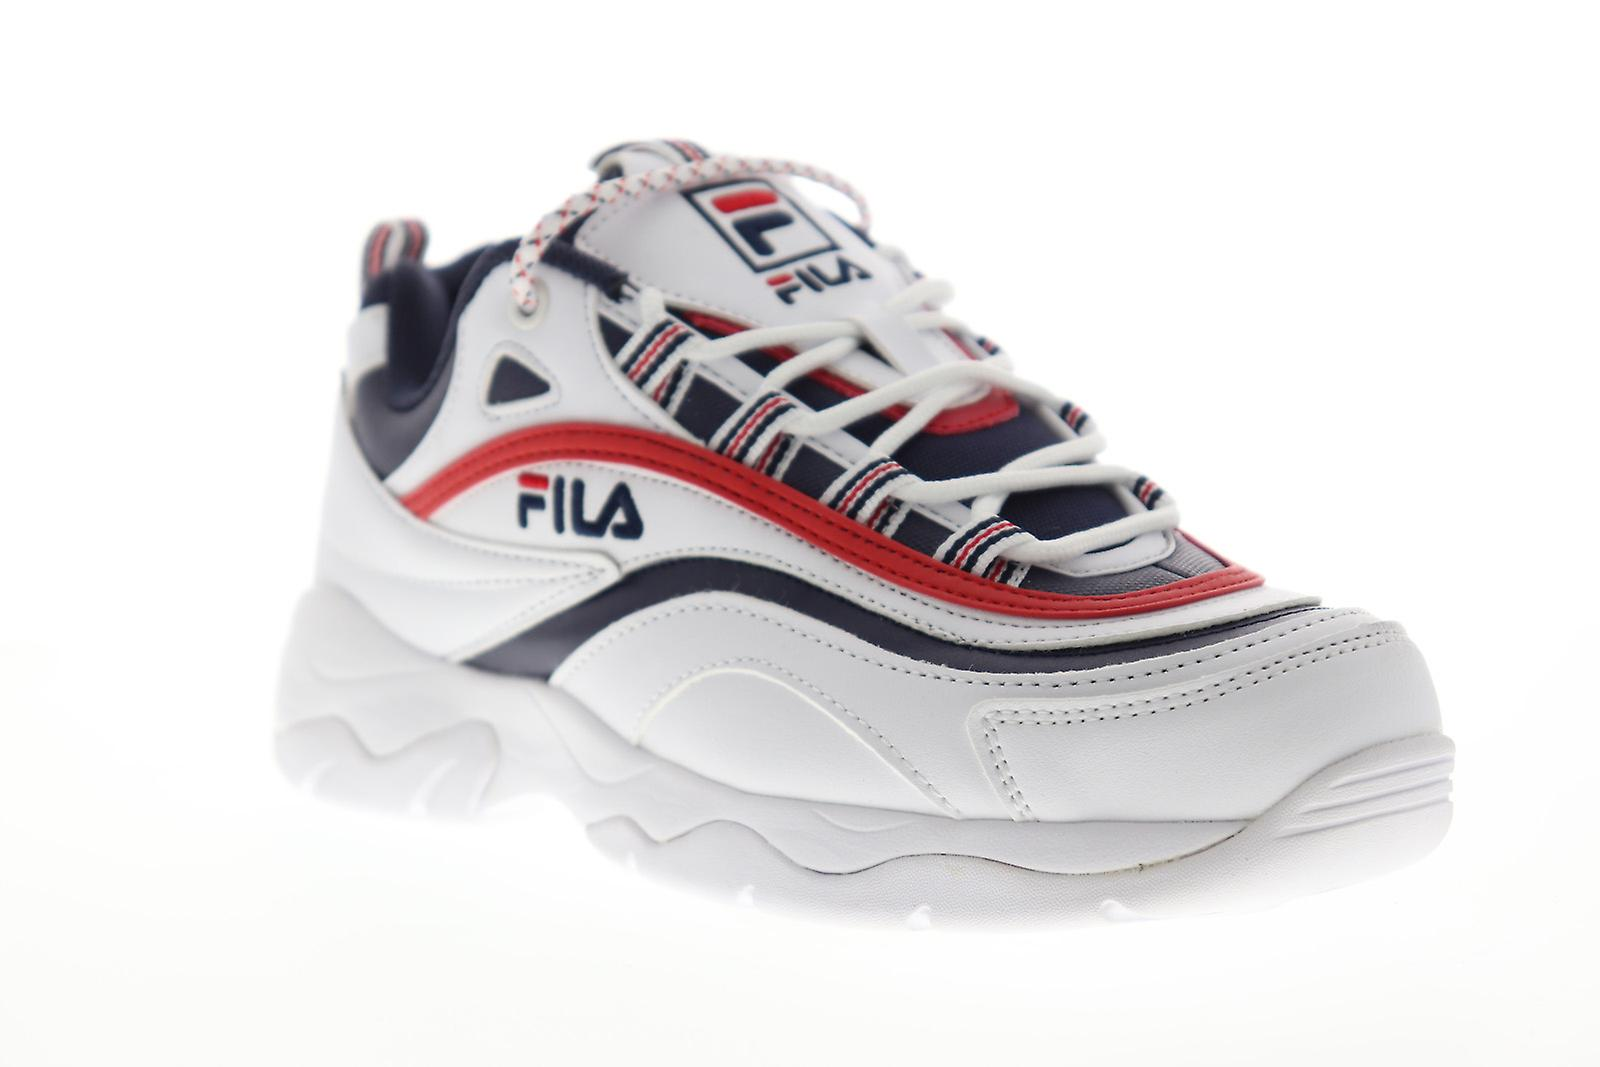 Fila Ray menns hvit casual Lace opp lav topp joggesko sko